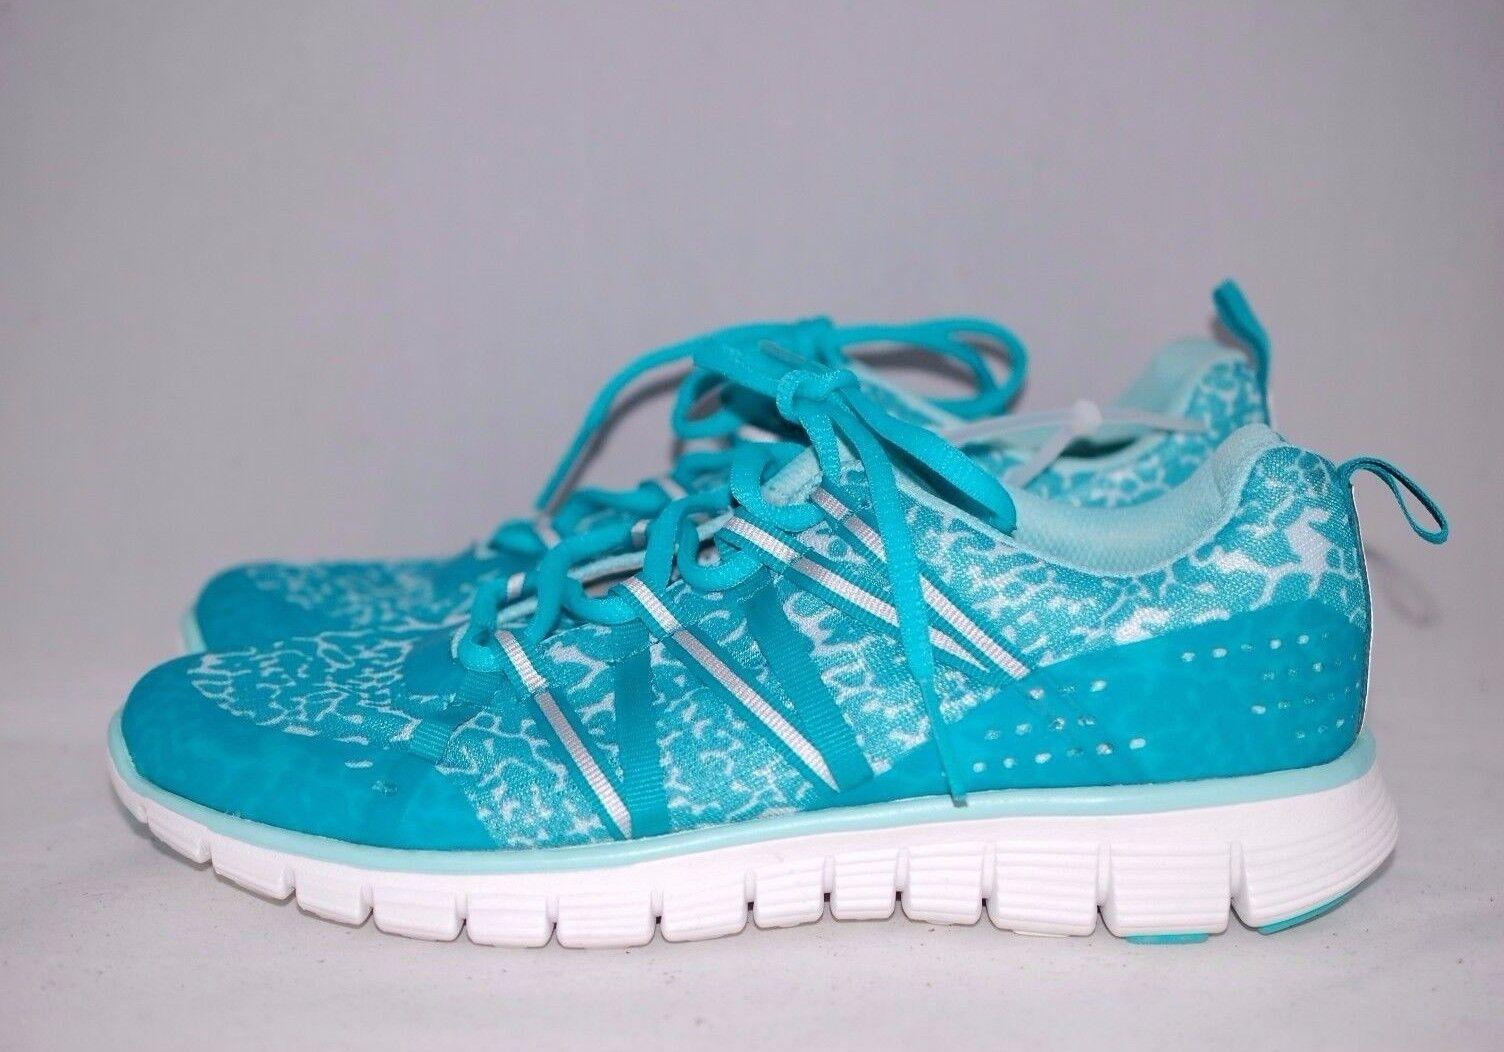 ZELLA Mint Vivid Damens's Leopard Blau Dash Runnin Damens's Vivid Sneaker Schuhes 8 US / 39 EU 272dff